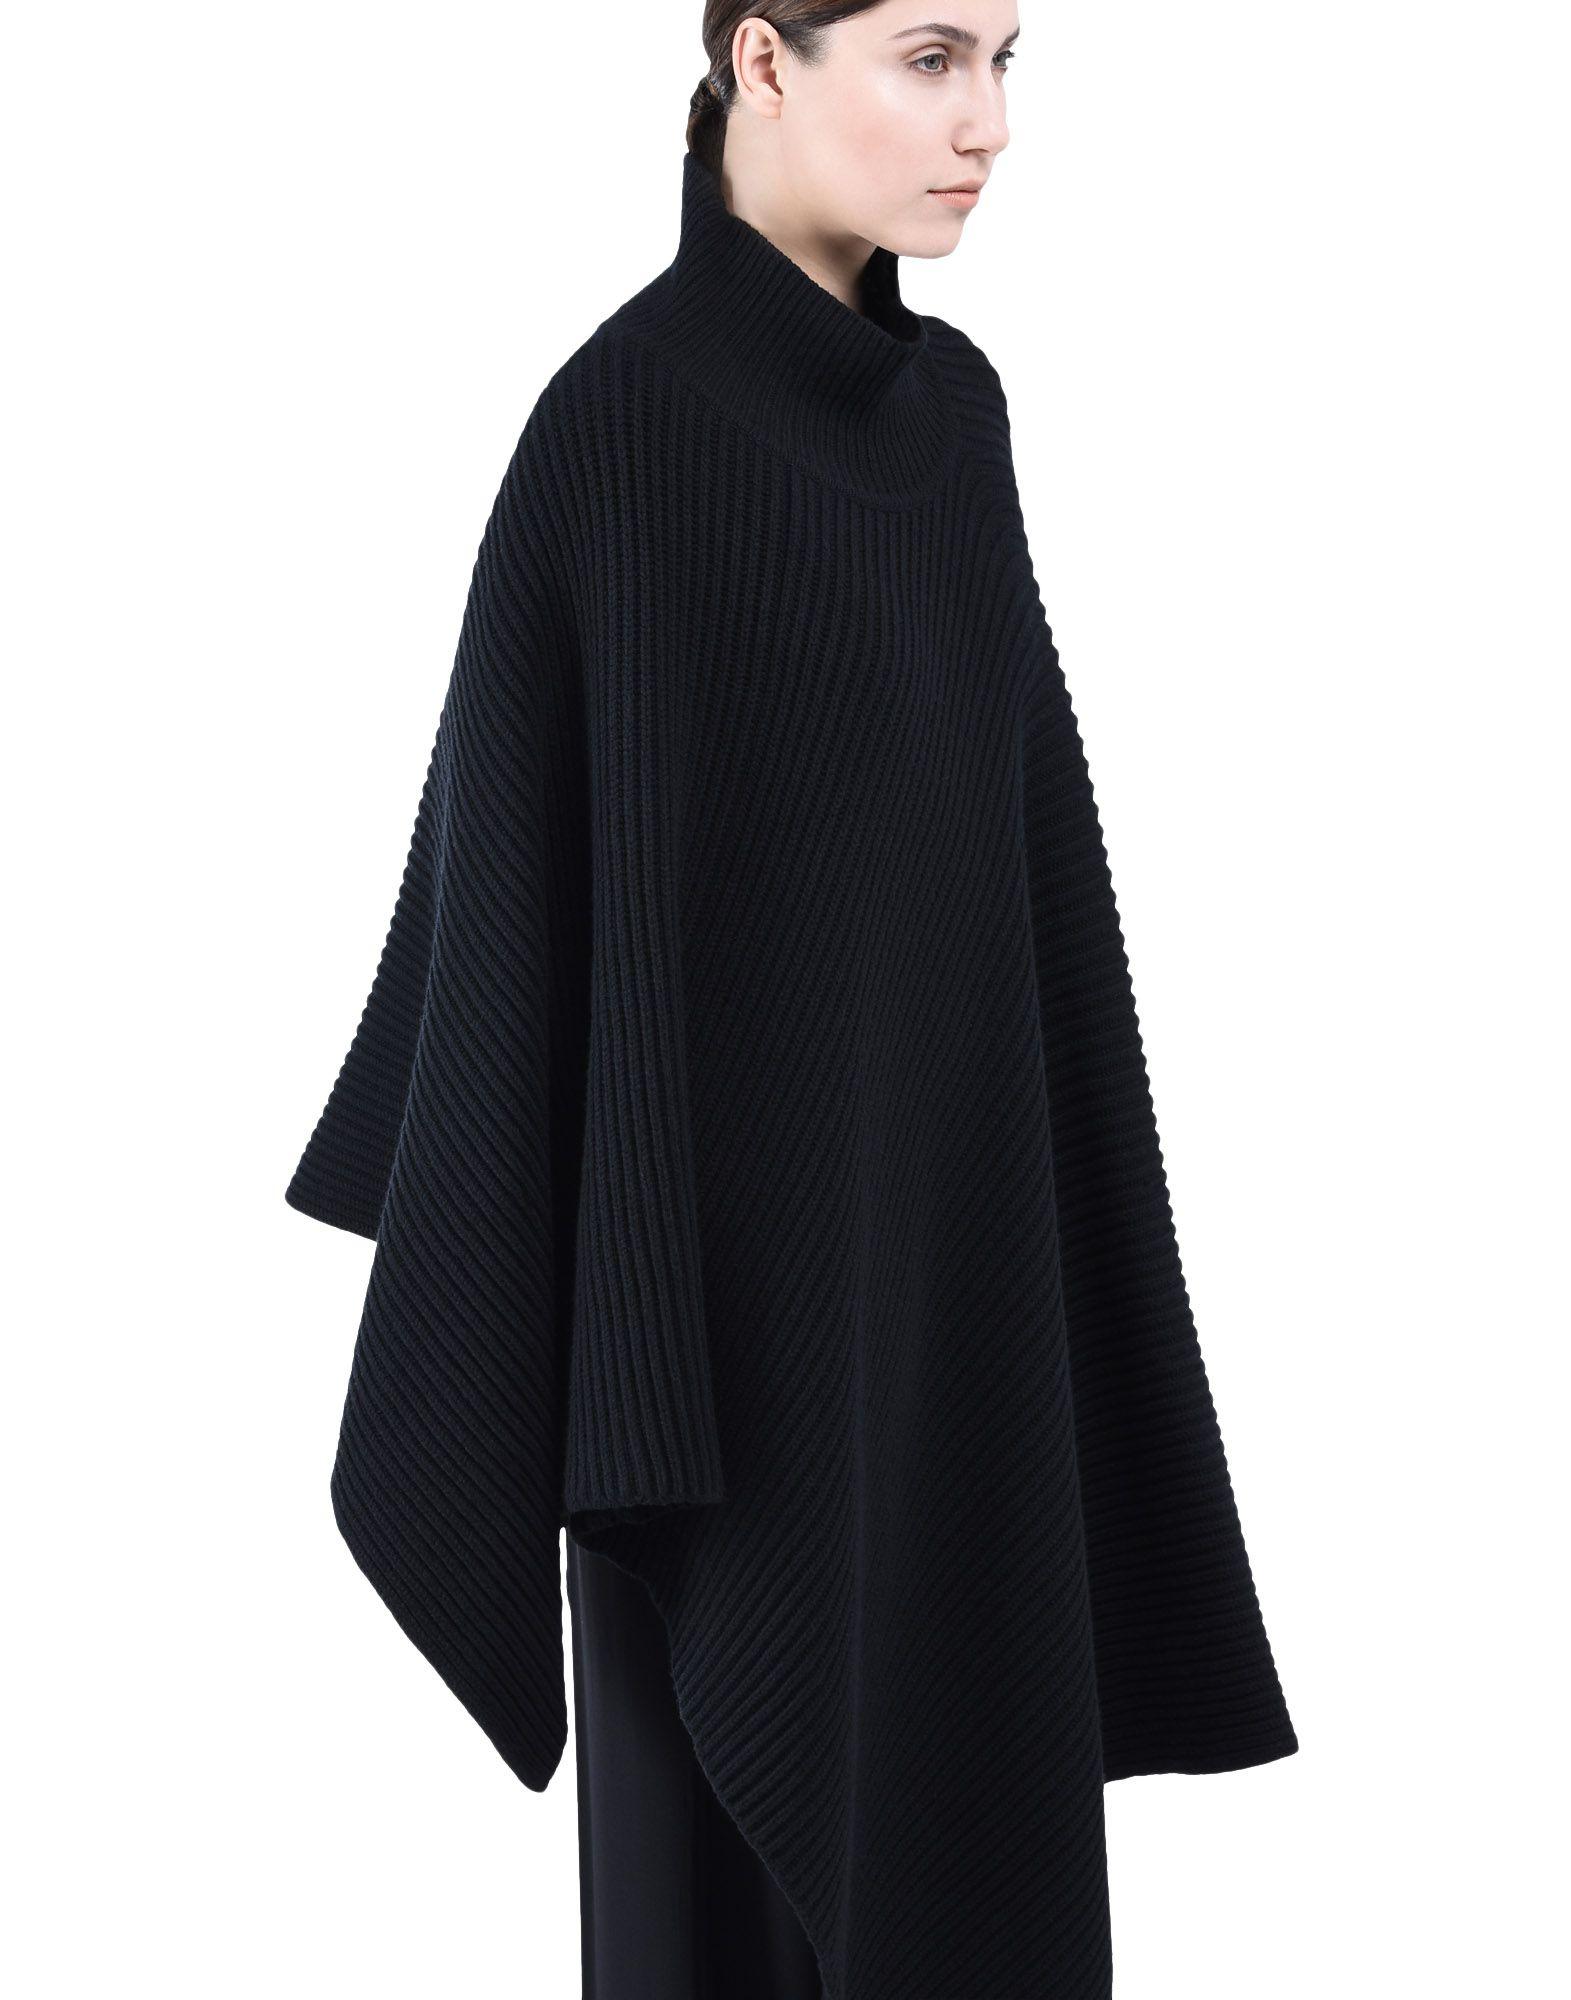 Cloak - JIL SANDER Online Store